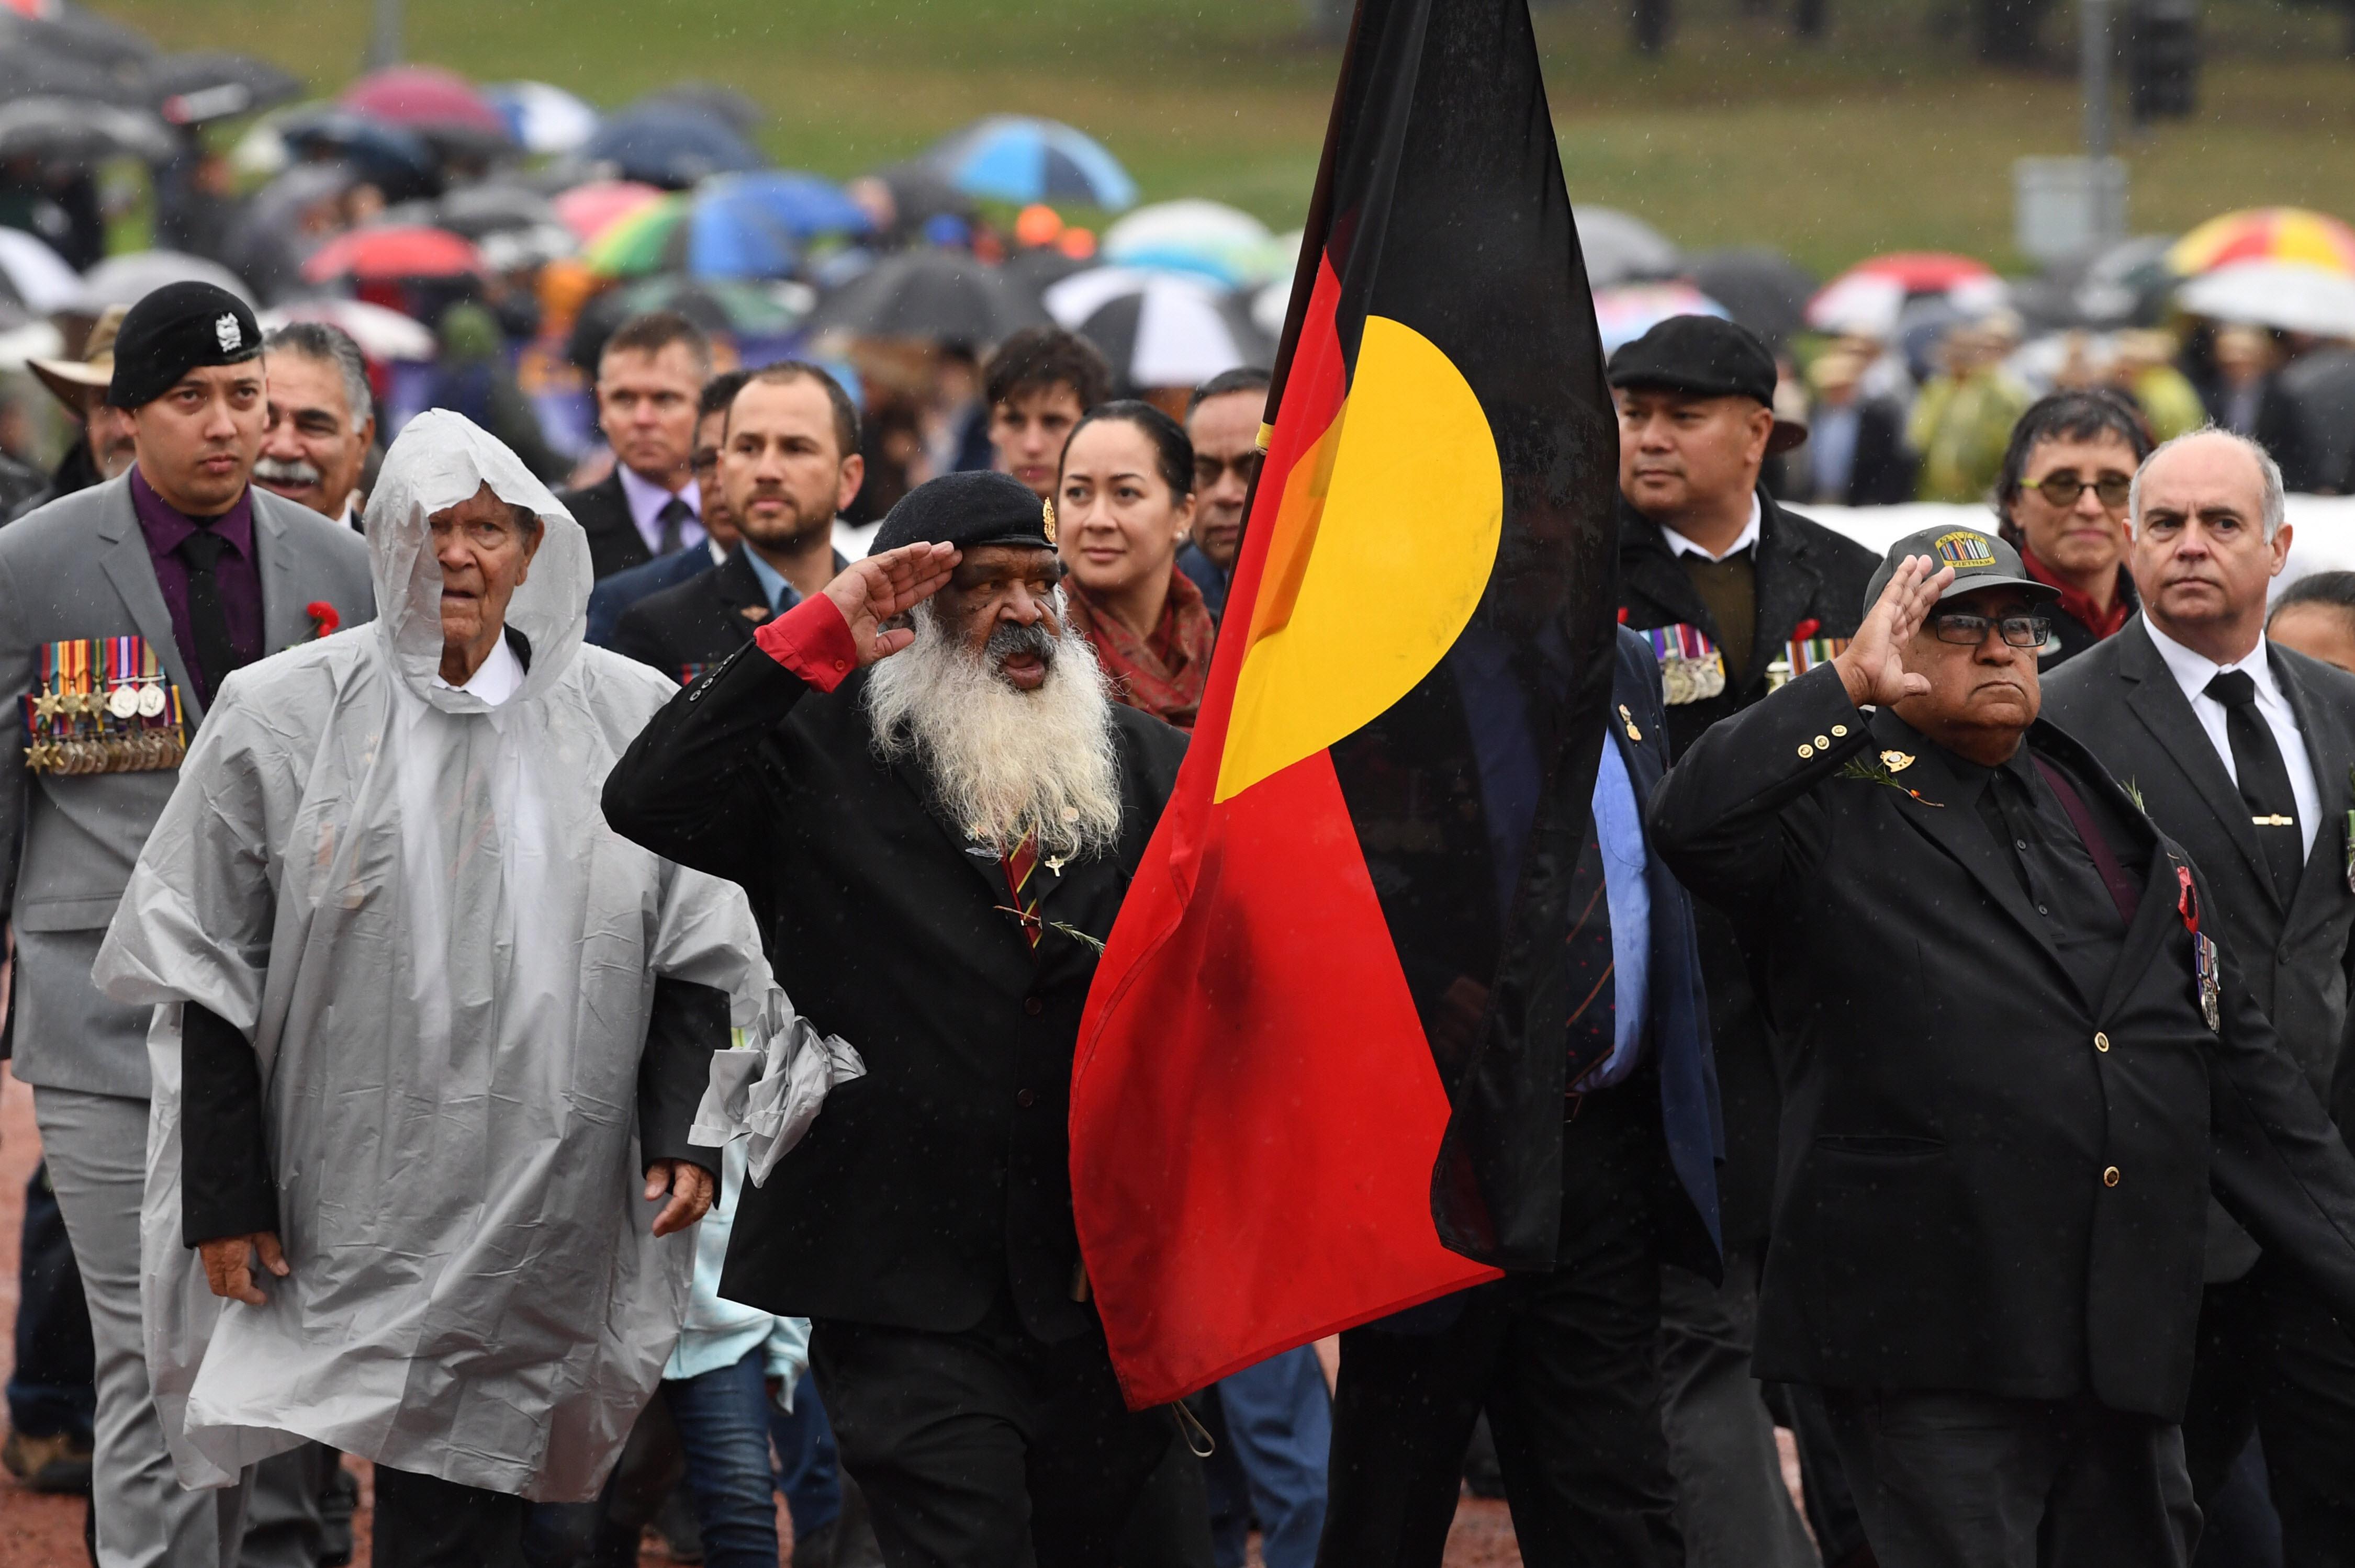 Indigenous soilders lead the ANZAC Day March